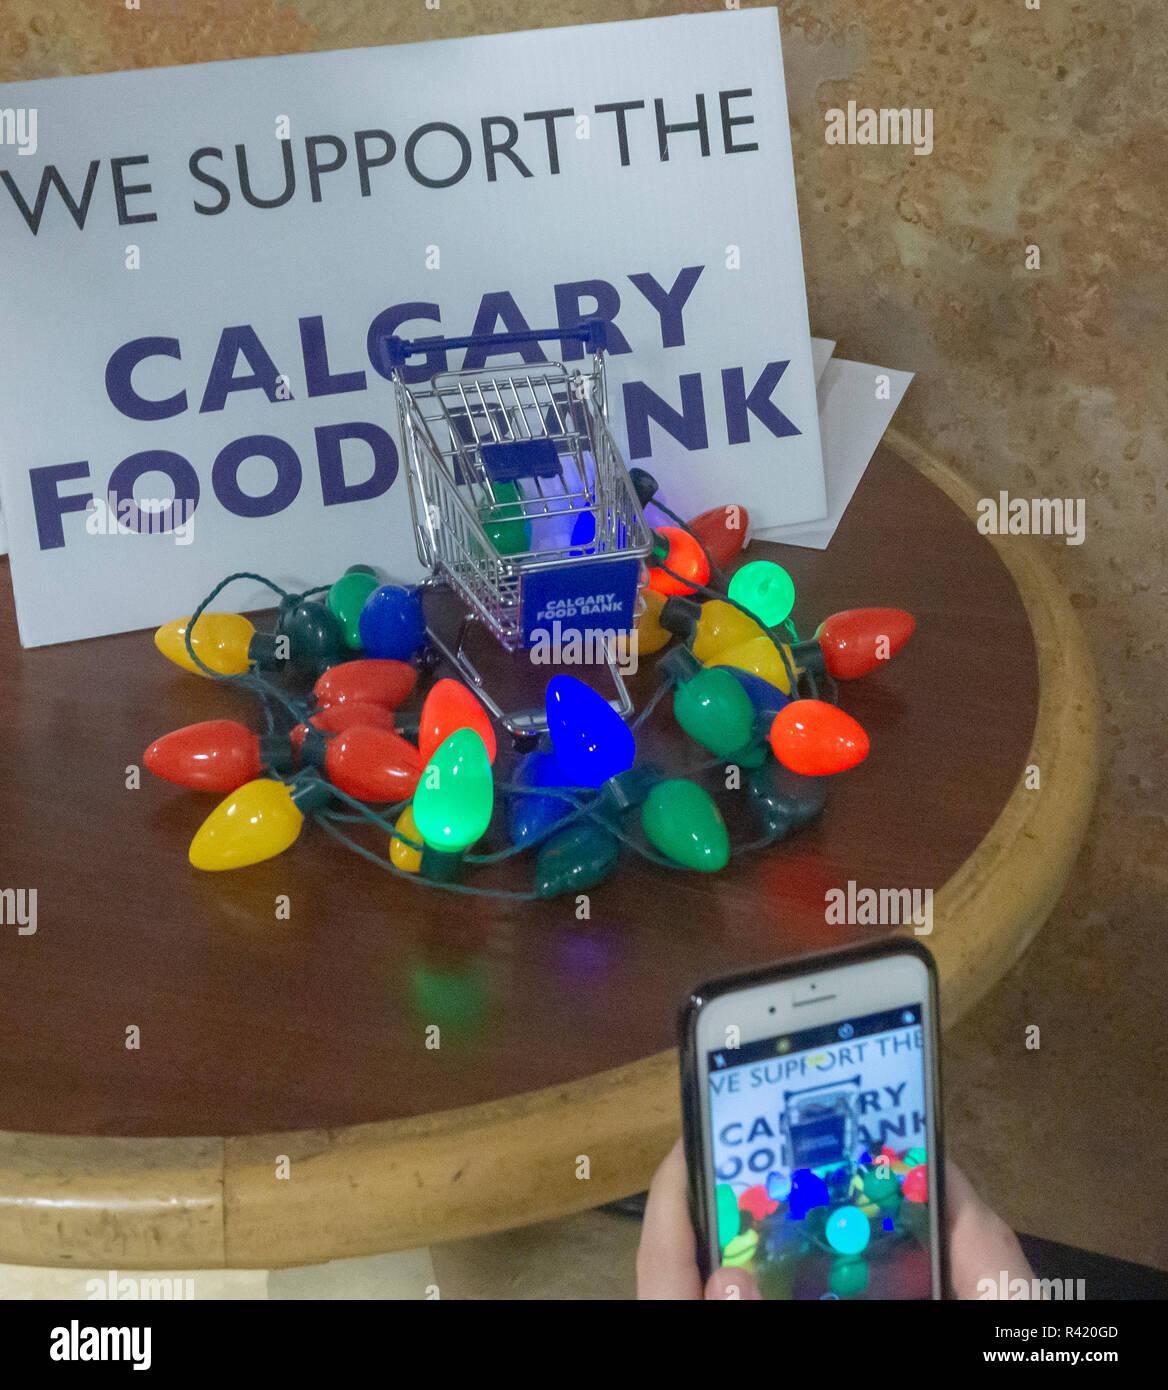 Calgary Food Back - Stock Image